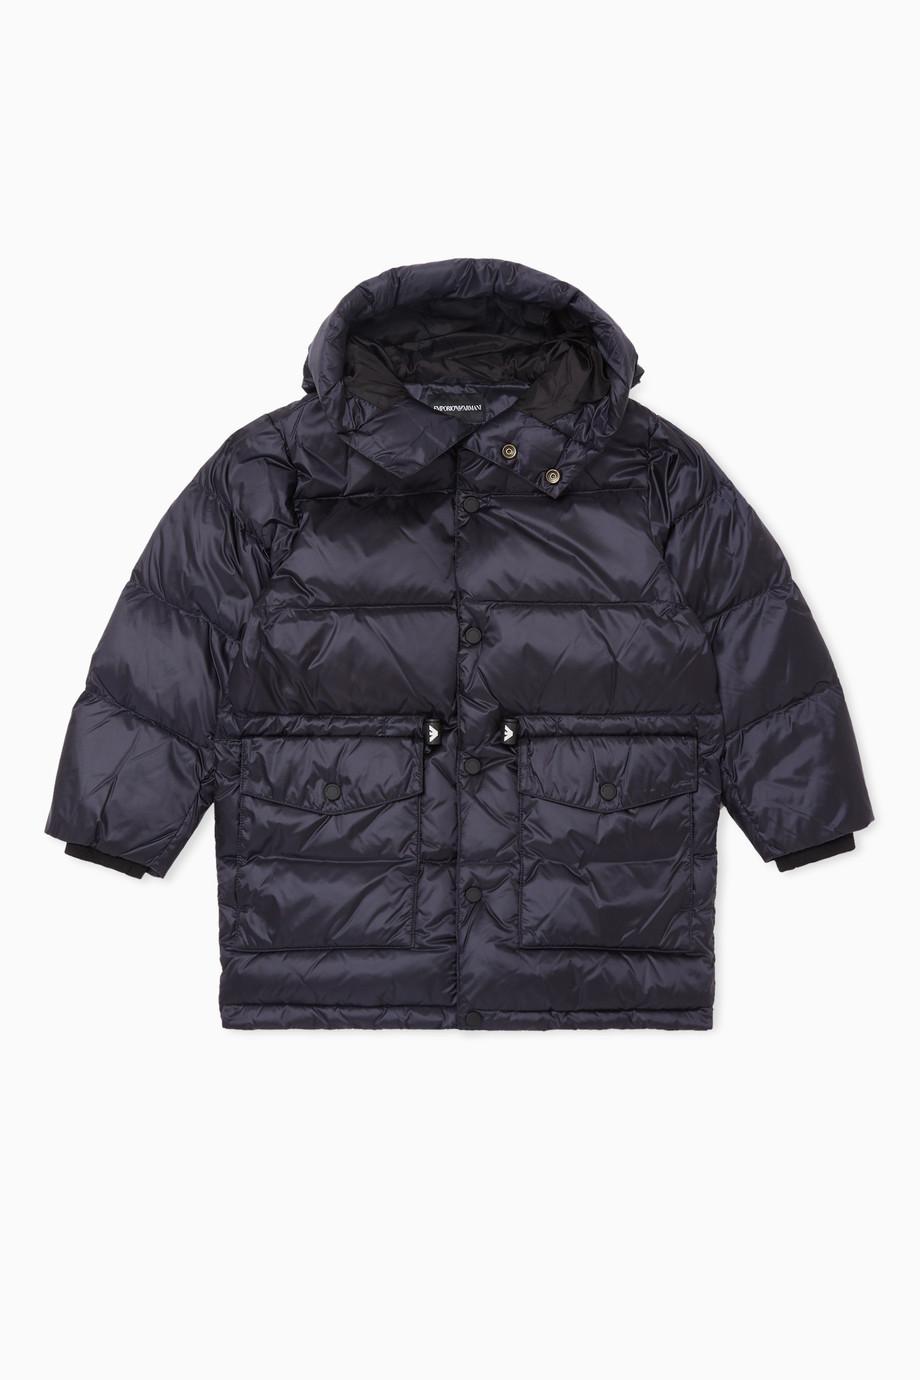 e61686b793 Shop Emporio Armani Blue Puffer Hooded Jacket for Kids | Ounass